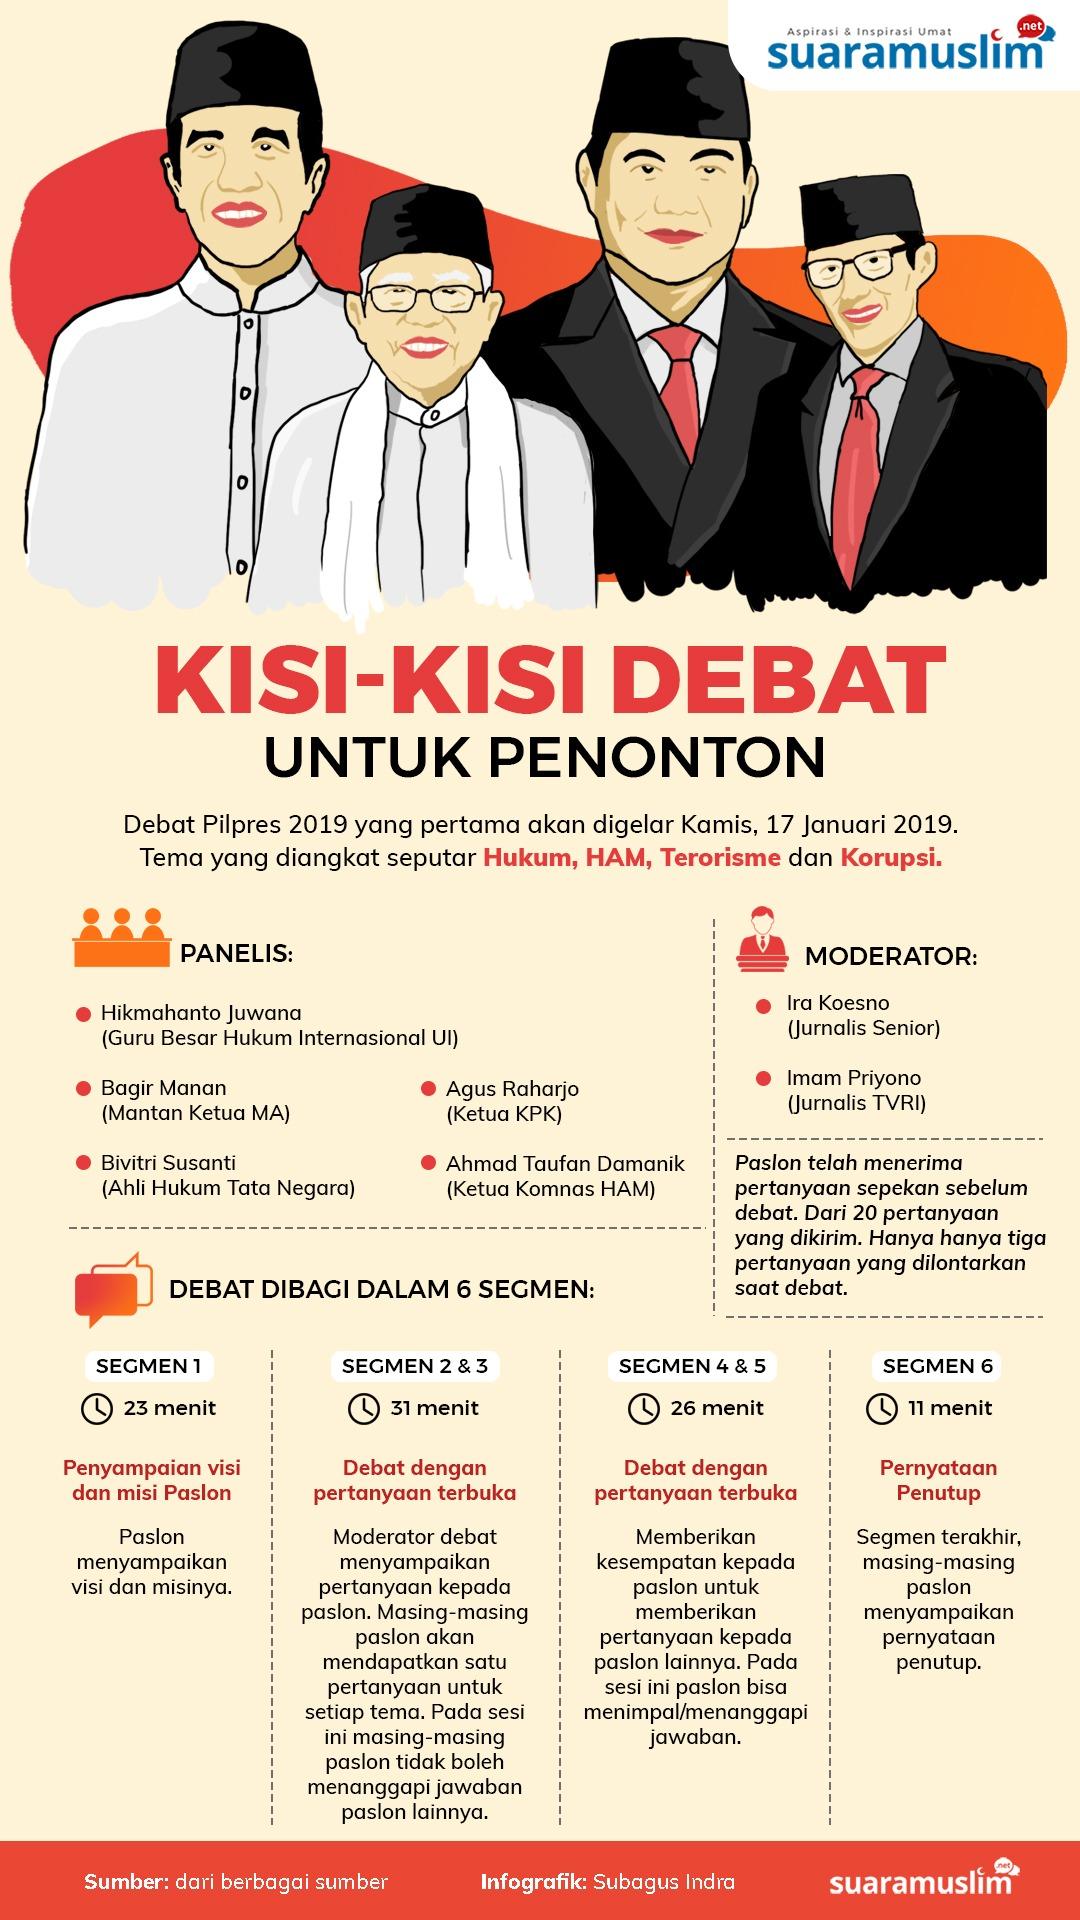 Kisi-Kisi Debat Capres 2019